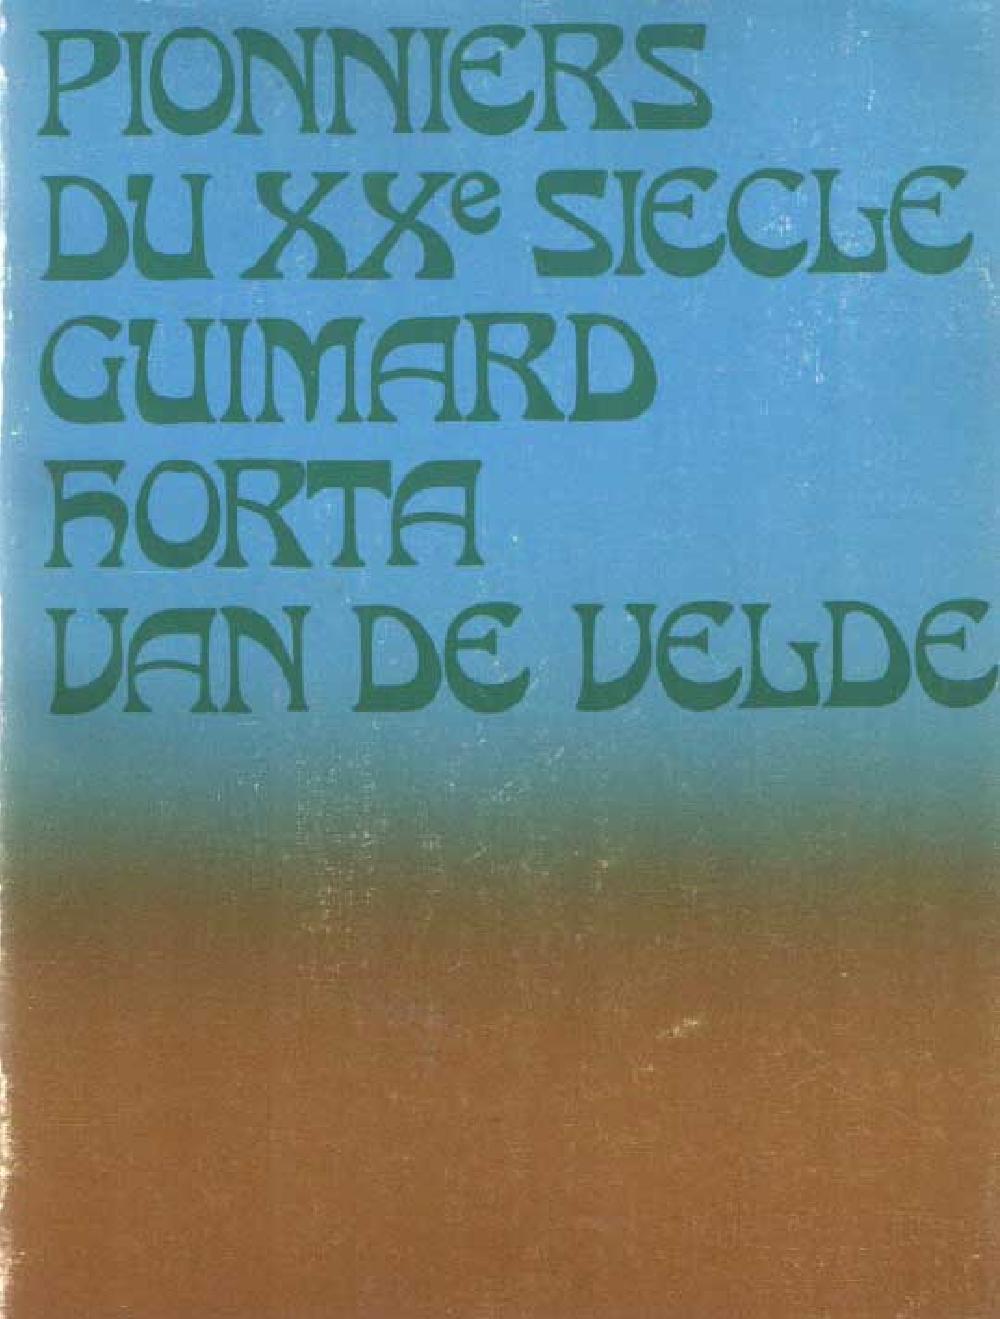 Pionniers du XXe siècle Guimard, Horta, Van de Velde